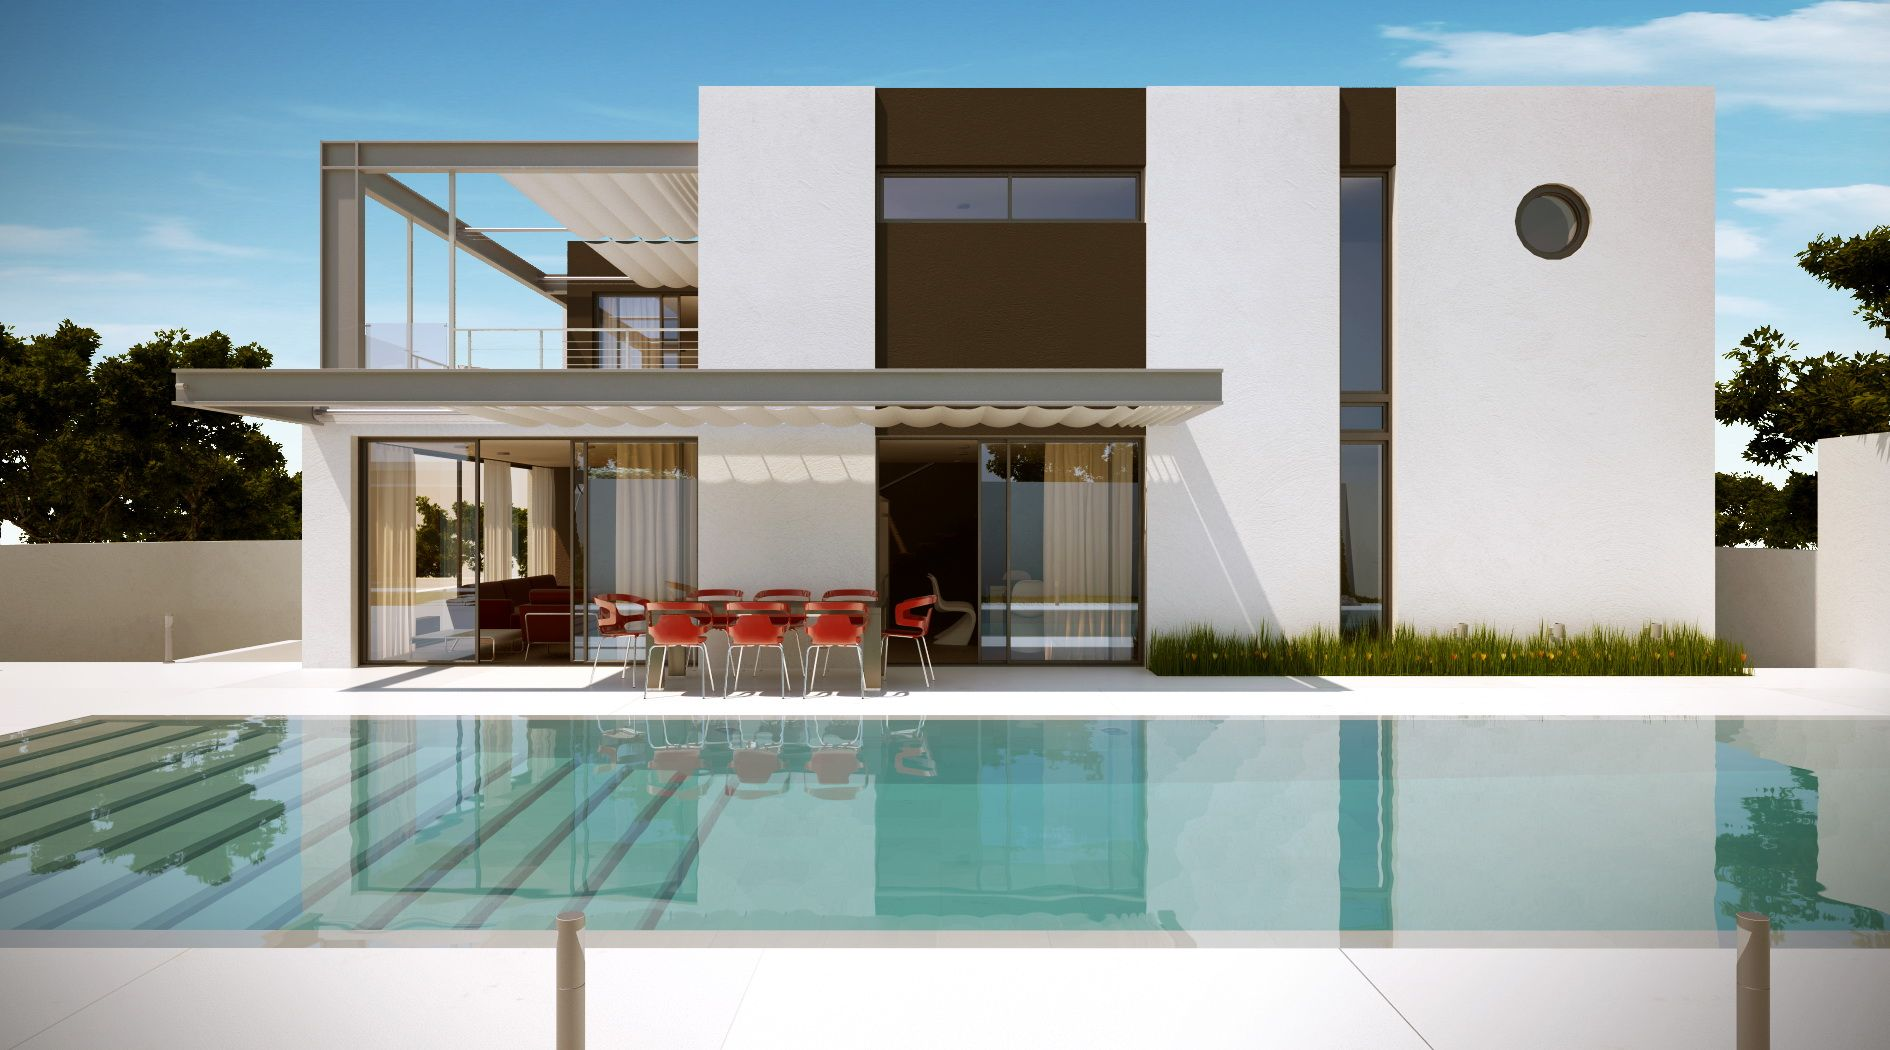 House bauhaus line architects arquitectura pinterest - Piscinas desmontables bauhaus ...